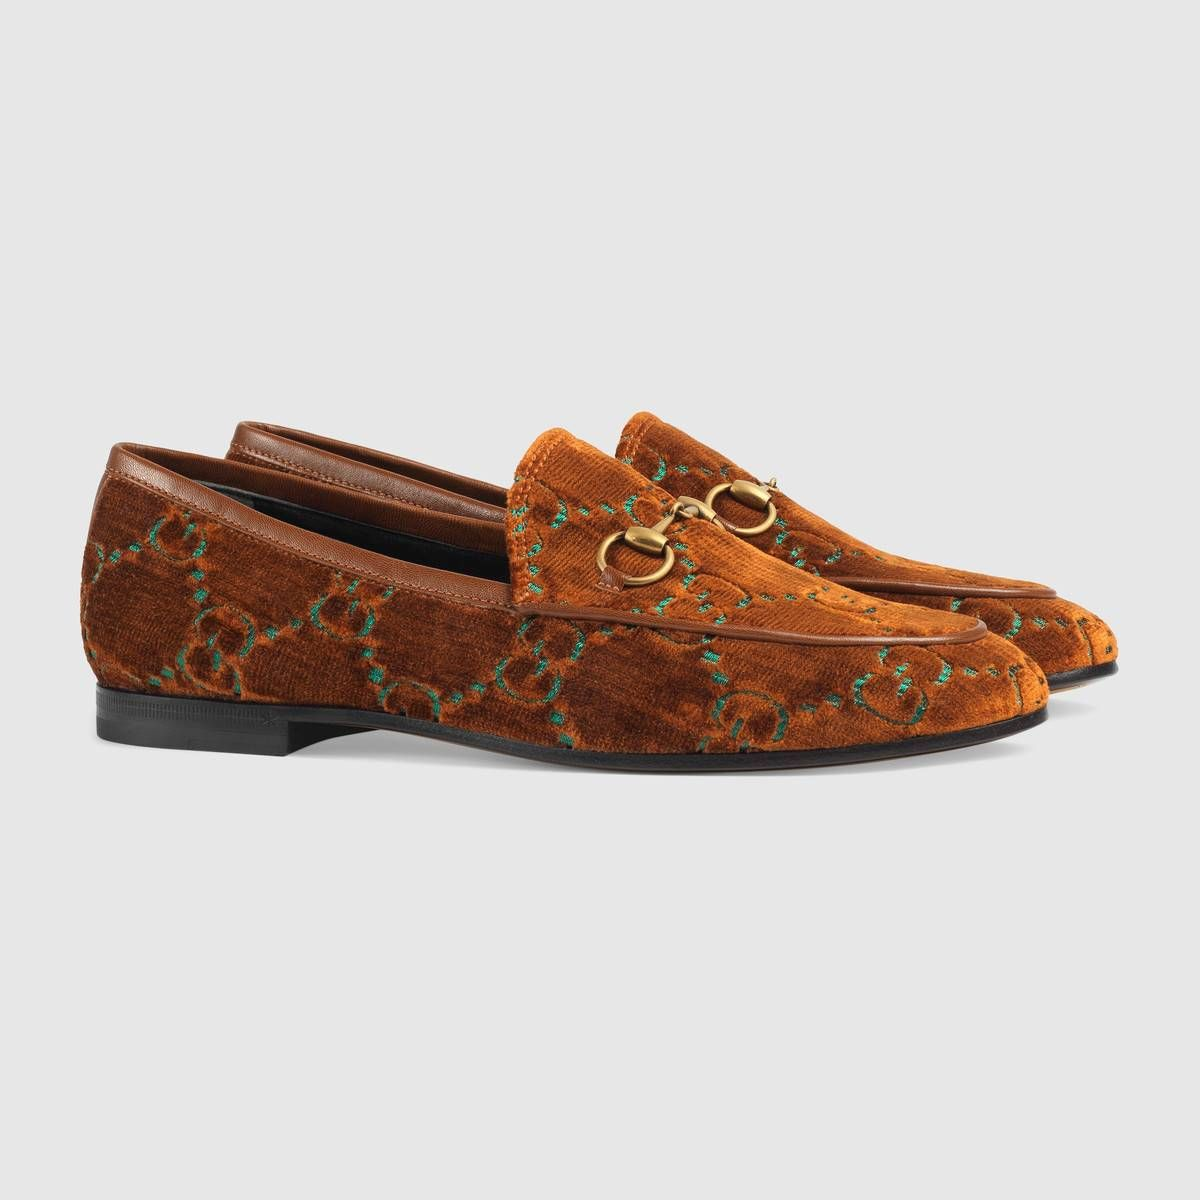 49f71b30e1 Gucci - Jordaan GG cognac & emerald velvet loafer ($730) | FLATS in ...